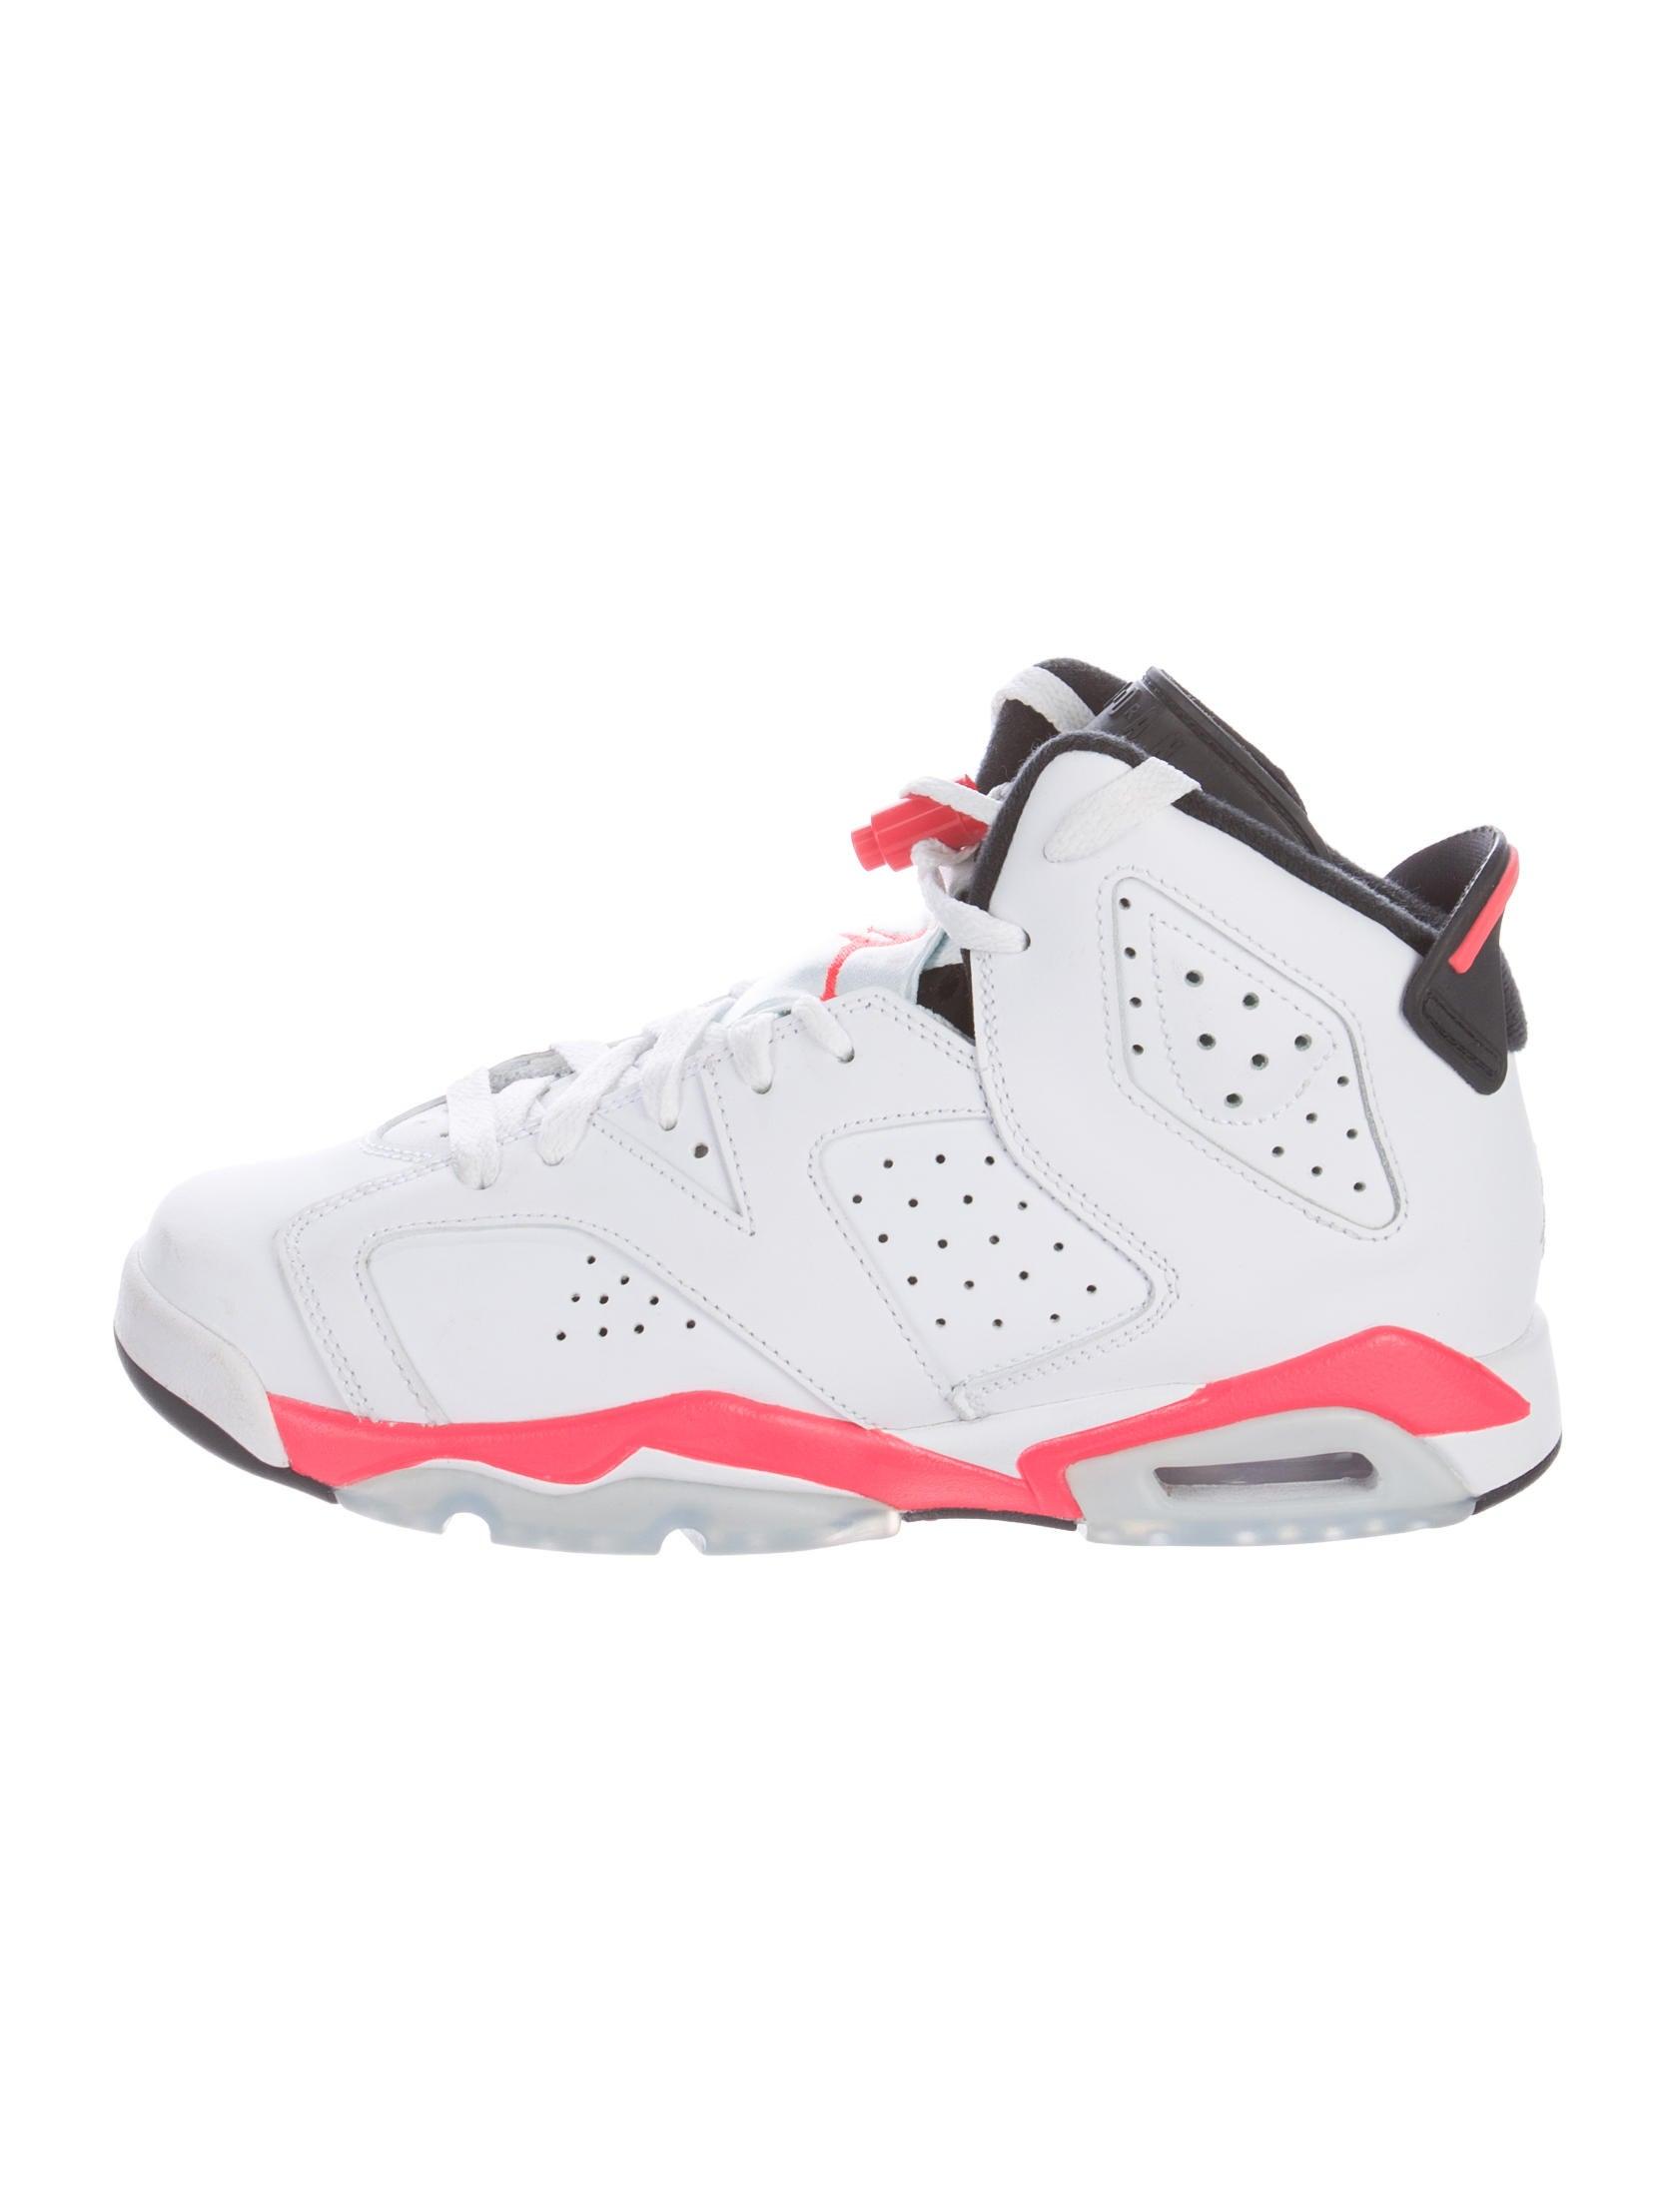 Nike Air Jordan Boys 39 6 Retro High Top Sneakers Boys Wniaj20133 The Realreal